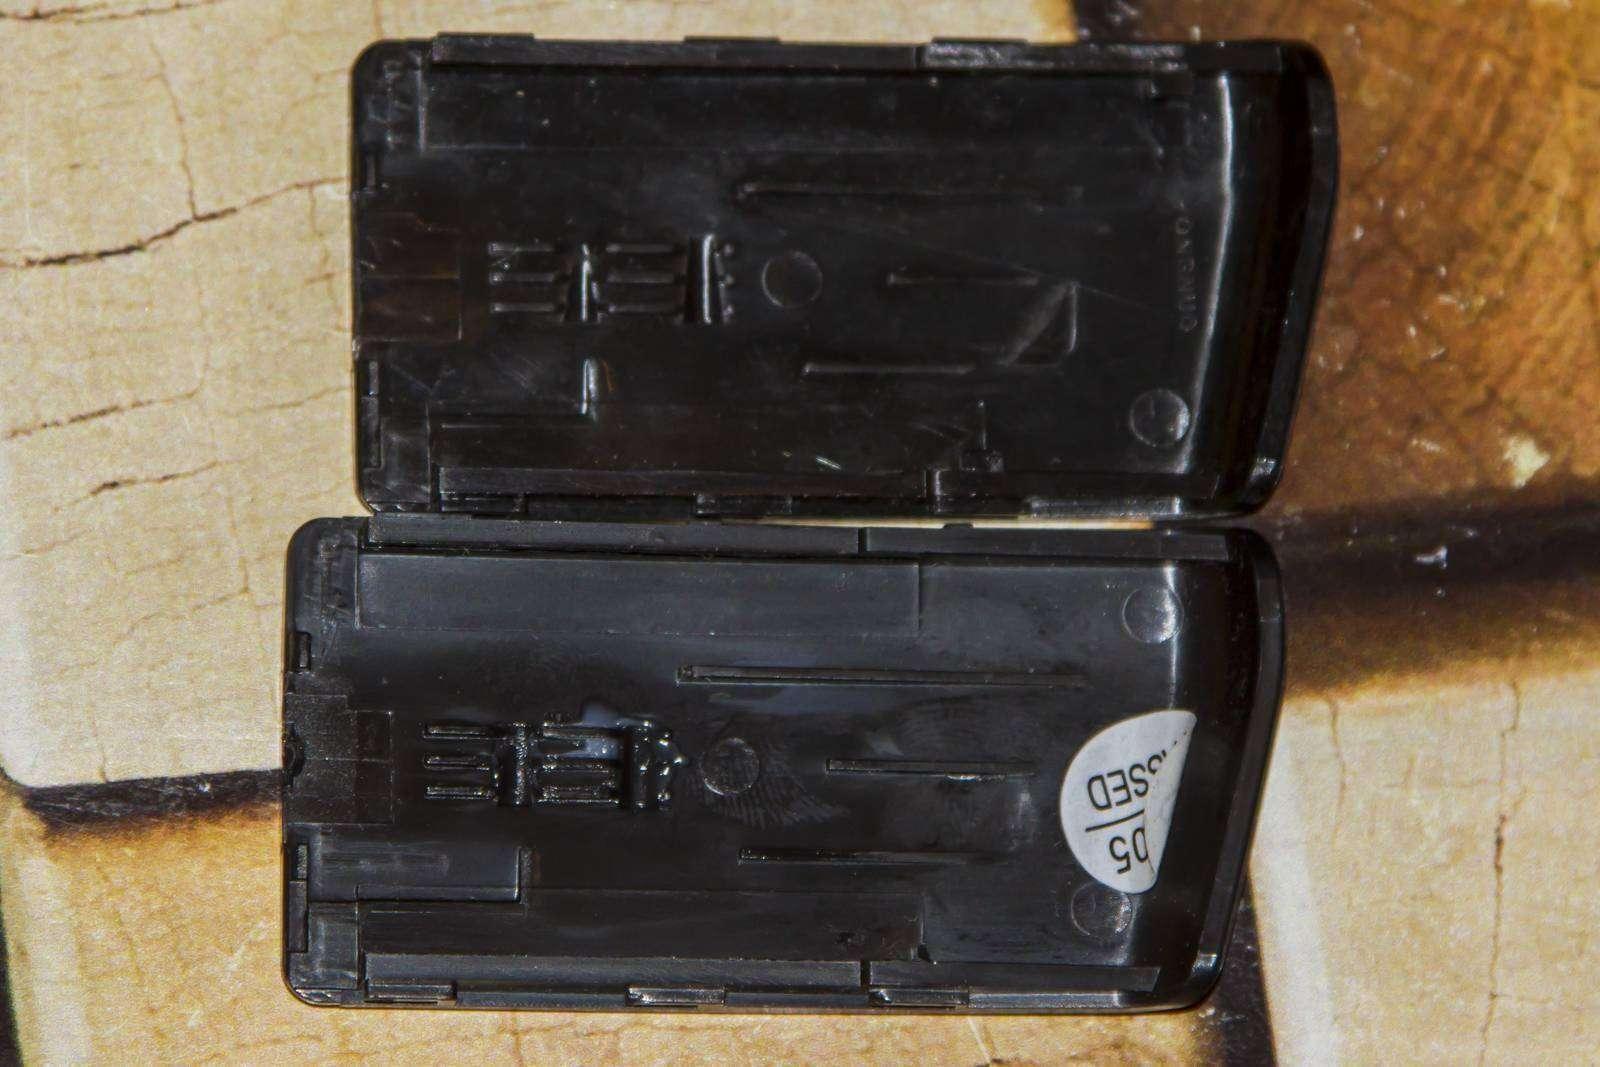 Aliexpress: Крышка батарейного отсека для фотовспышки YONGNUO YN-568EX